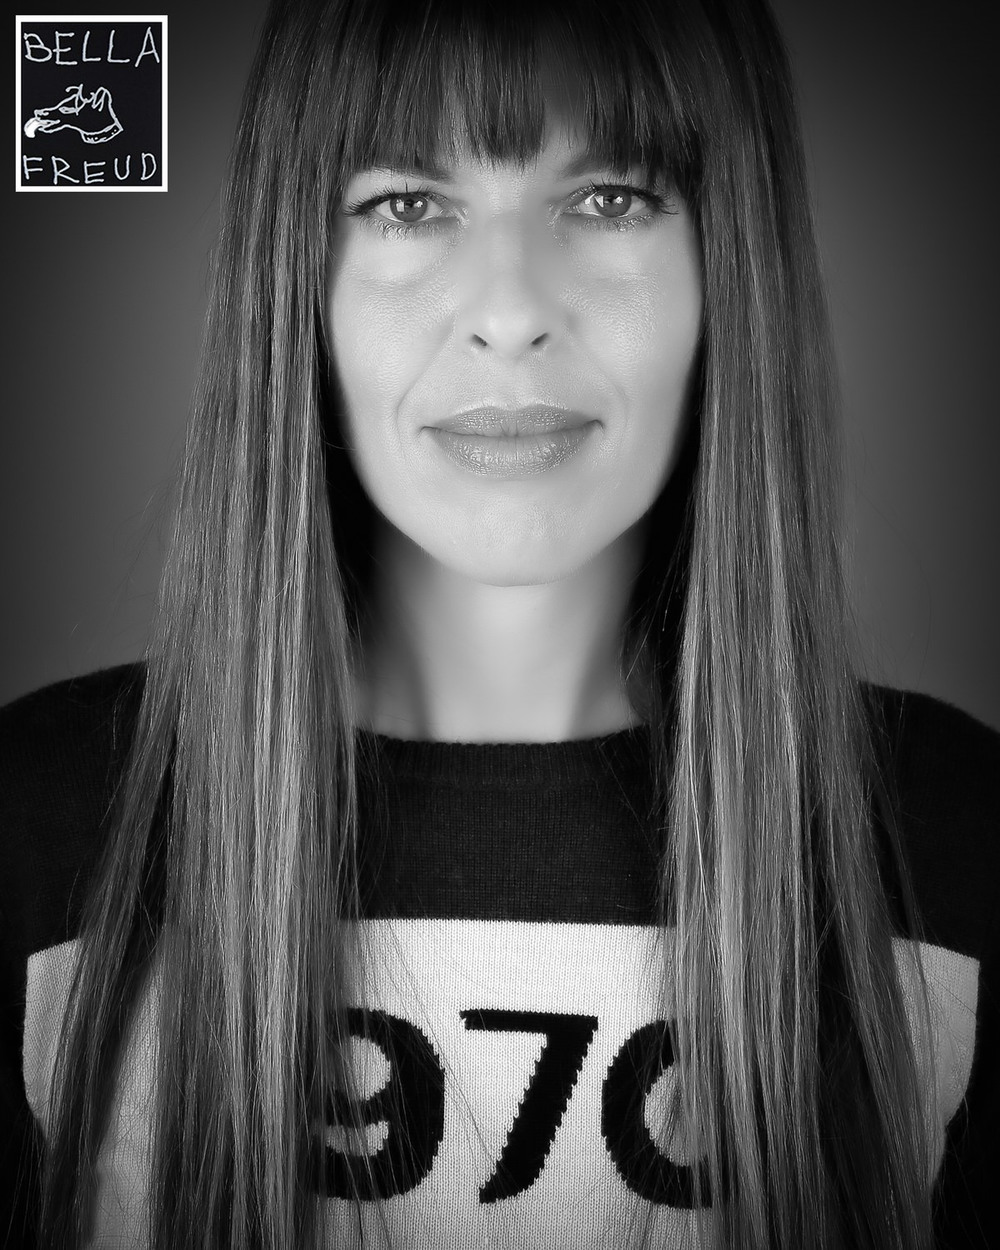 Bella Freud Clothing/Photography